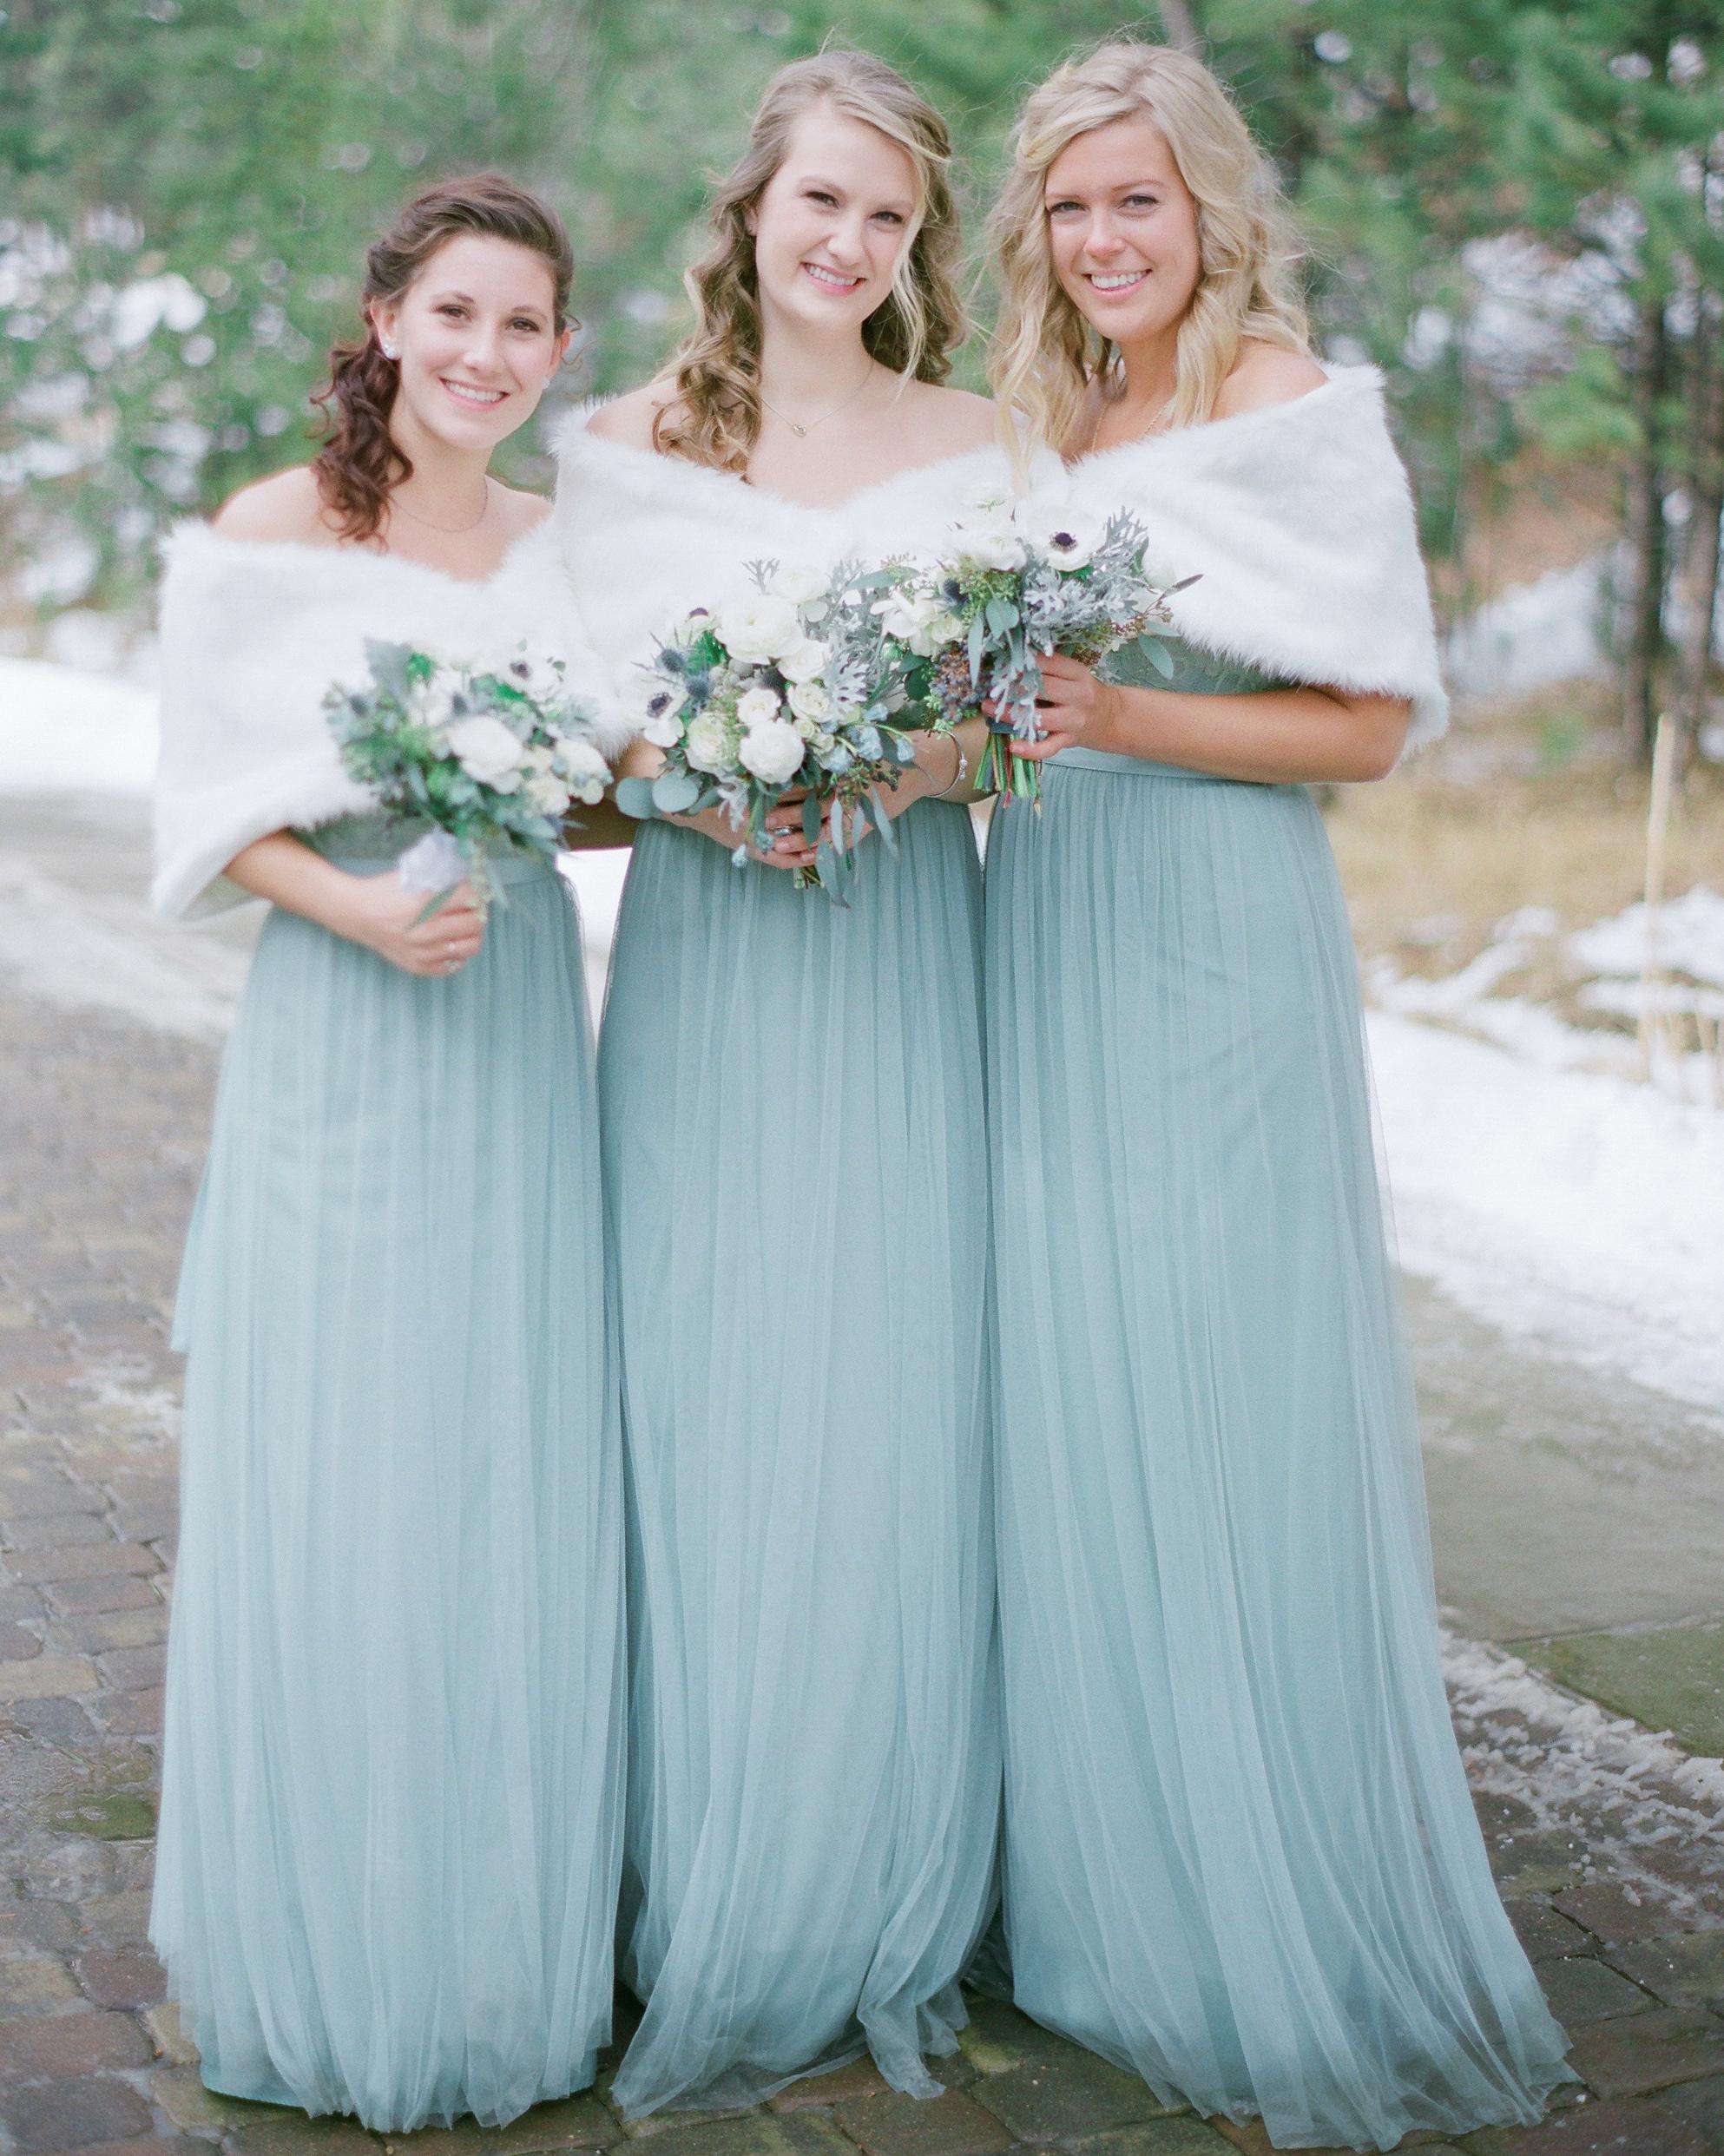 kendall-grant-wedding-bridesmaids-059-s112328-1215.jpg